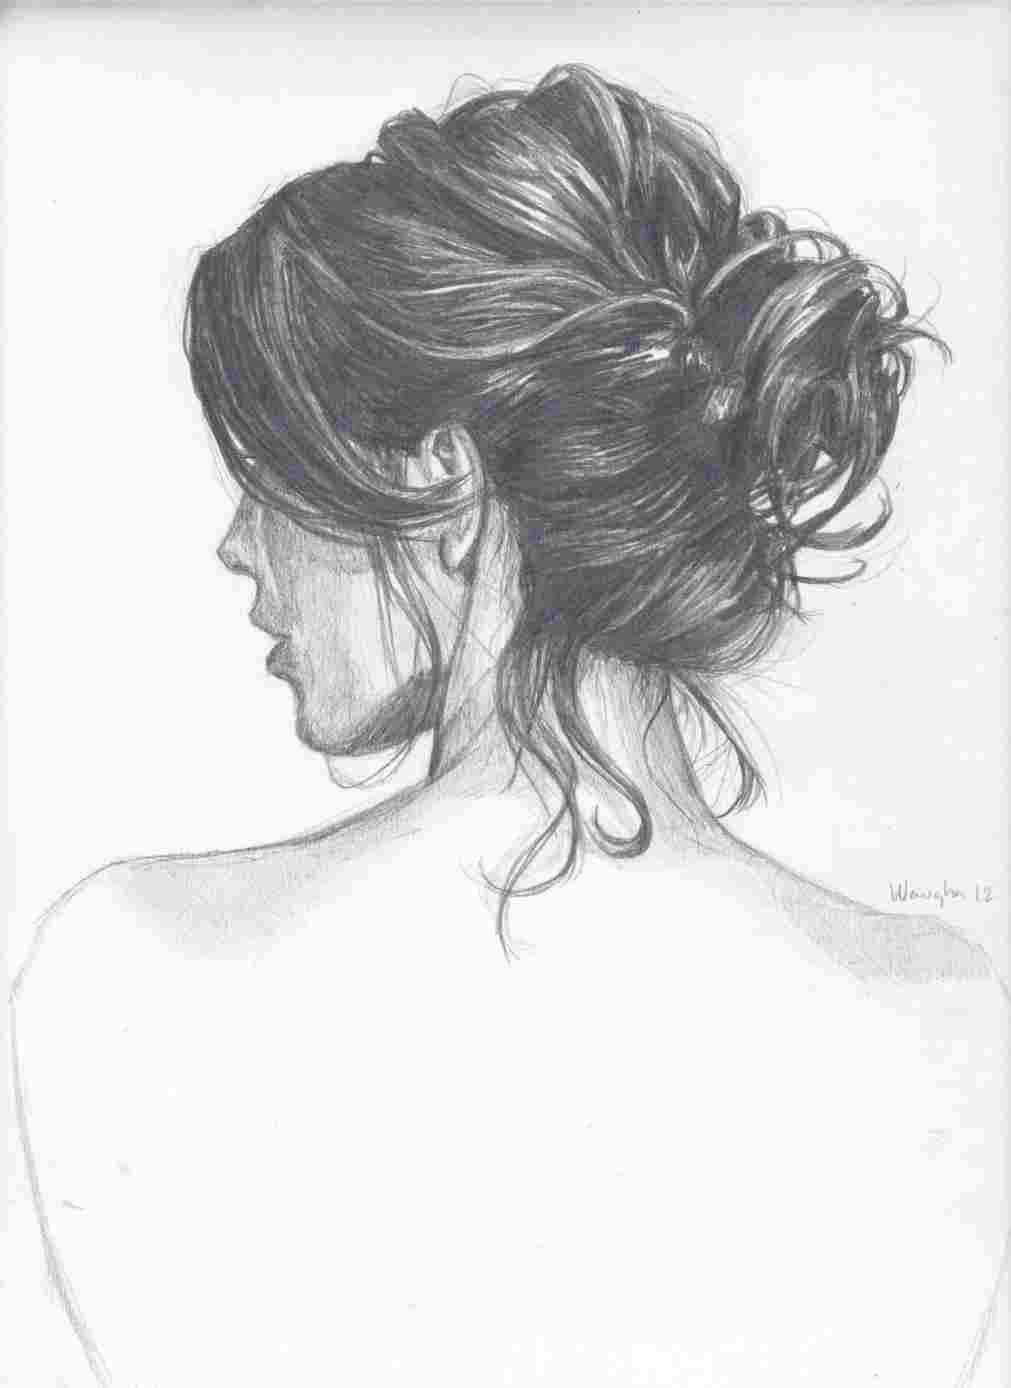 How To Draw Anime Hair Bun Anime Hairstyles Drawing Beautiful How To Anime Beautiful Bun How To Draw Hair Art Art Drawings